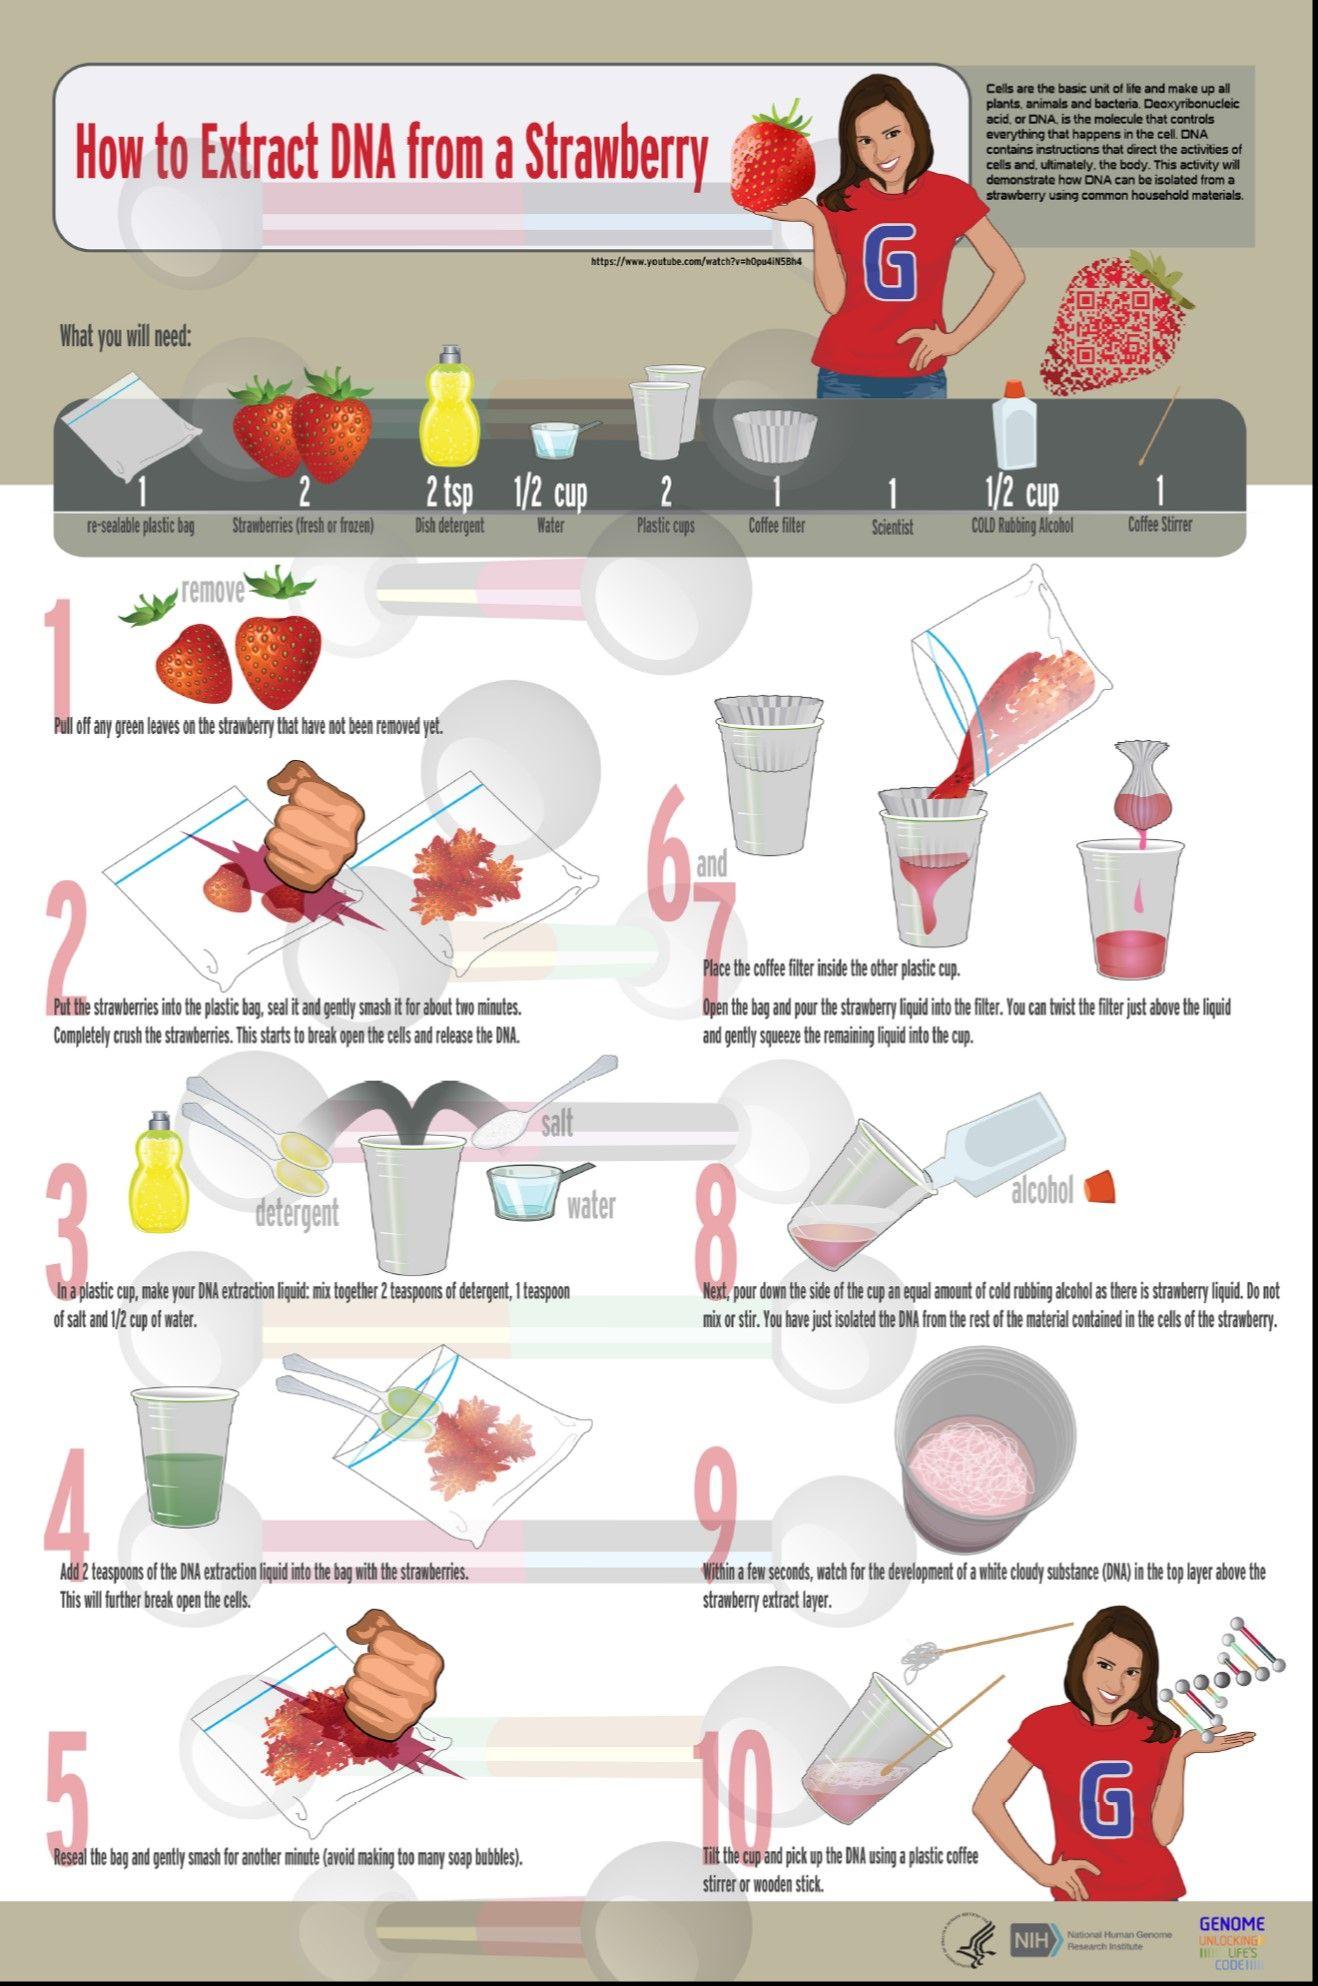 DNA extraction from strawberries | Dna activities, Dna ...